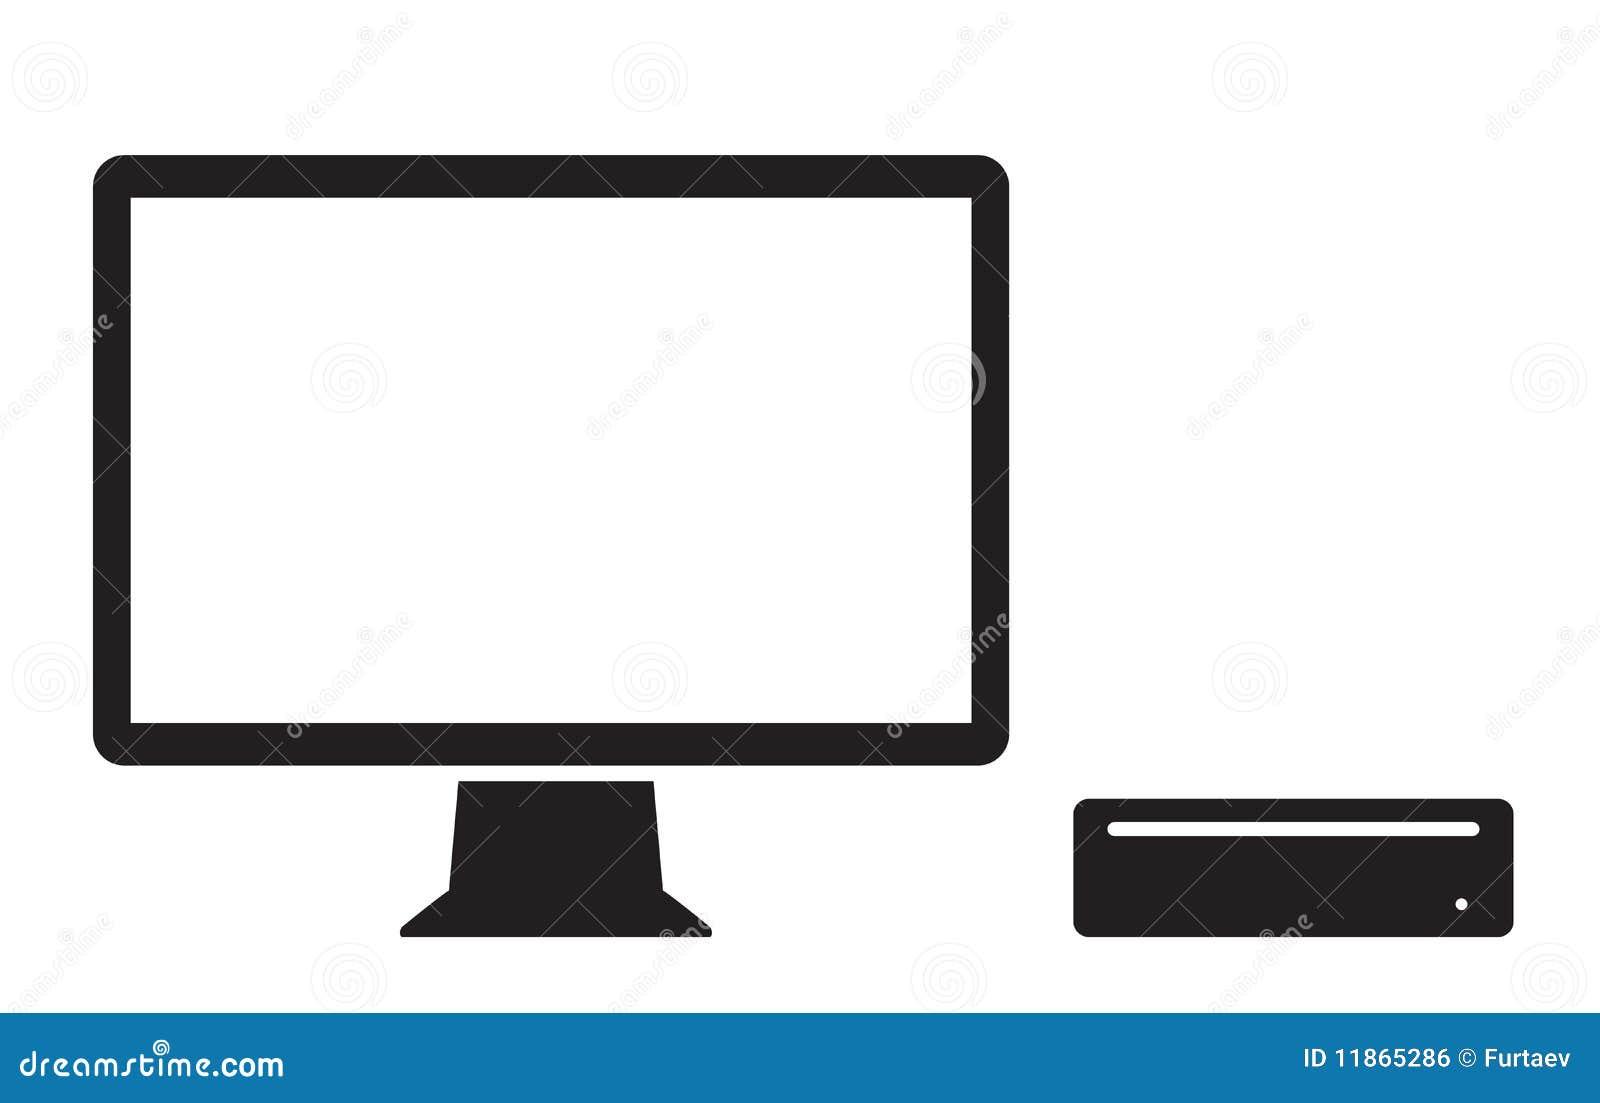 Minidatorsymbol